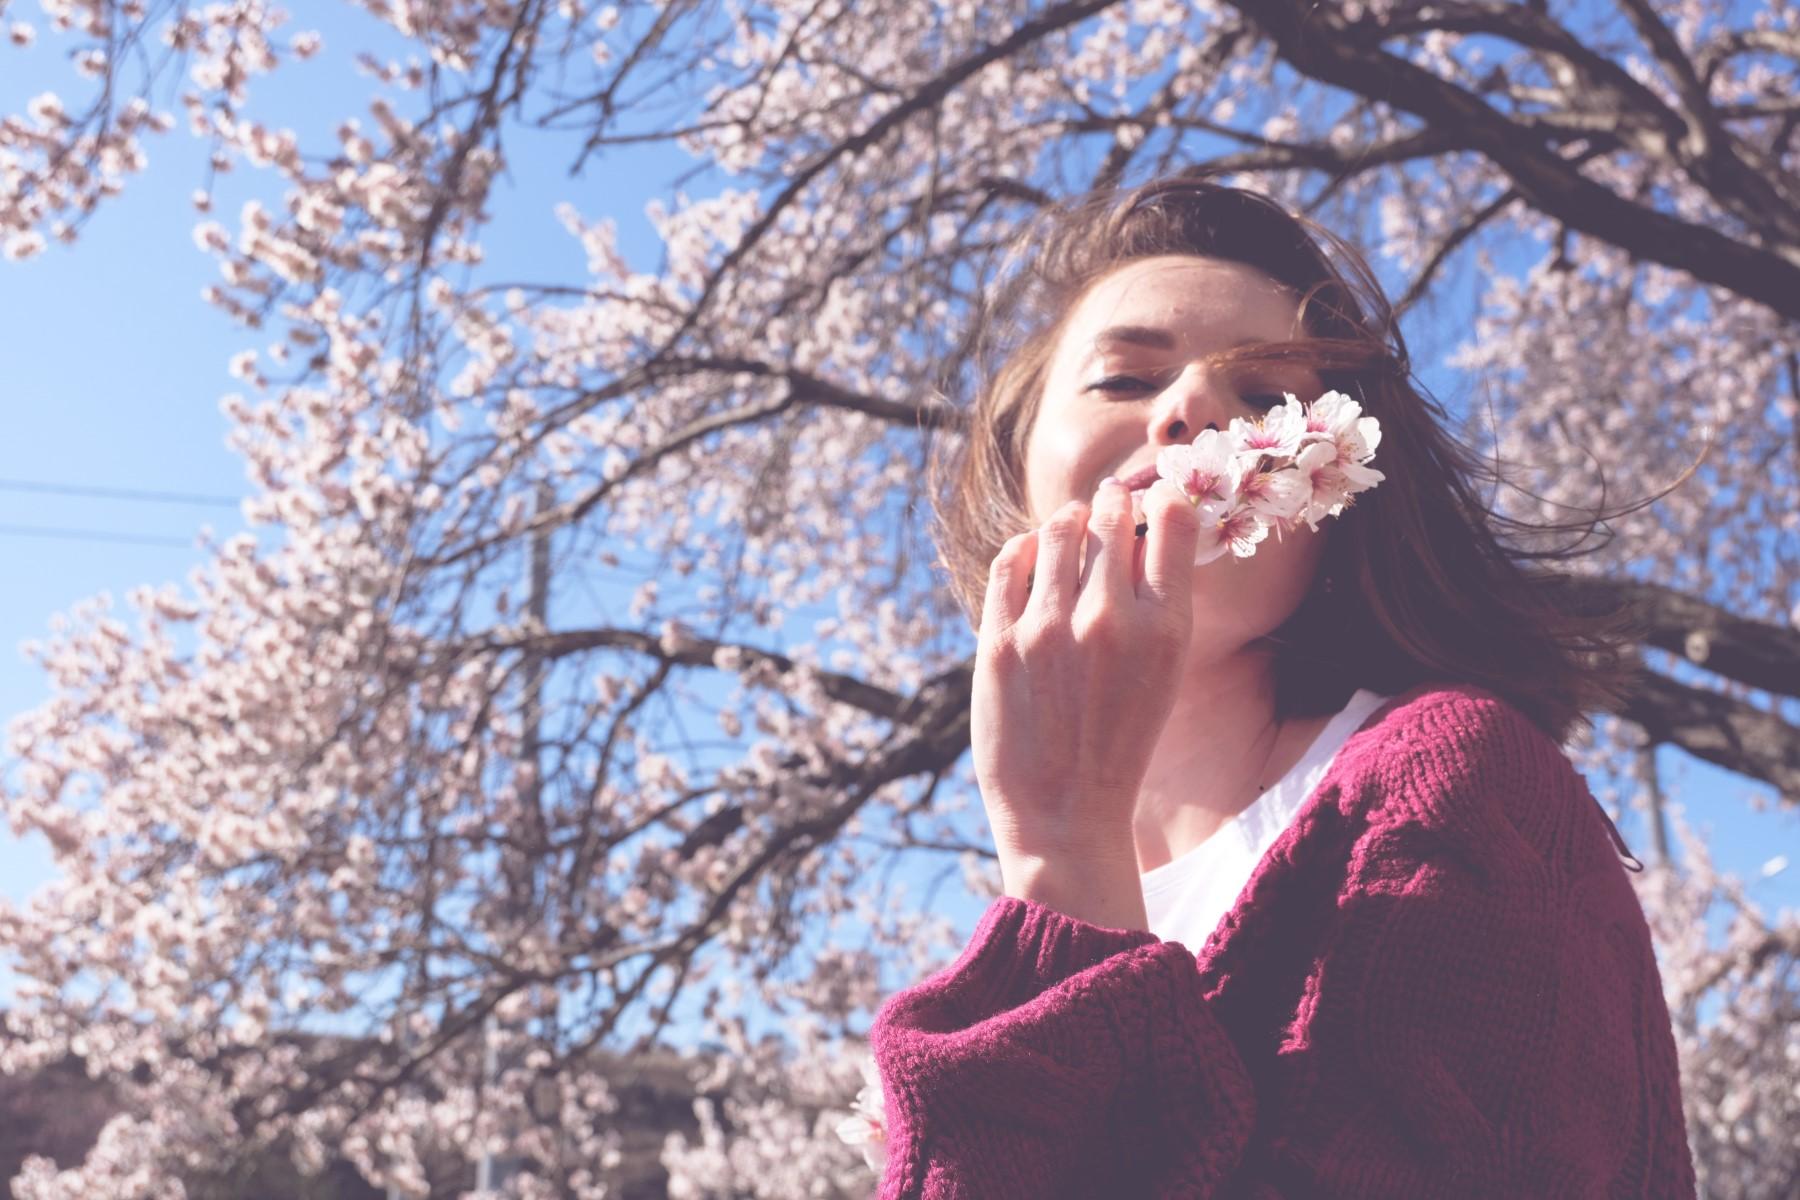 woman-cherry-blossom